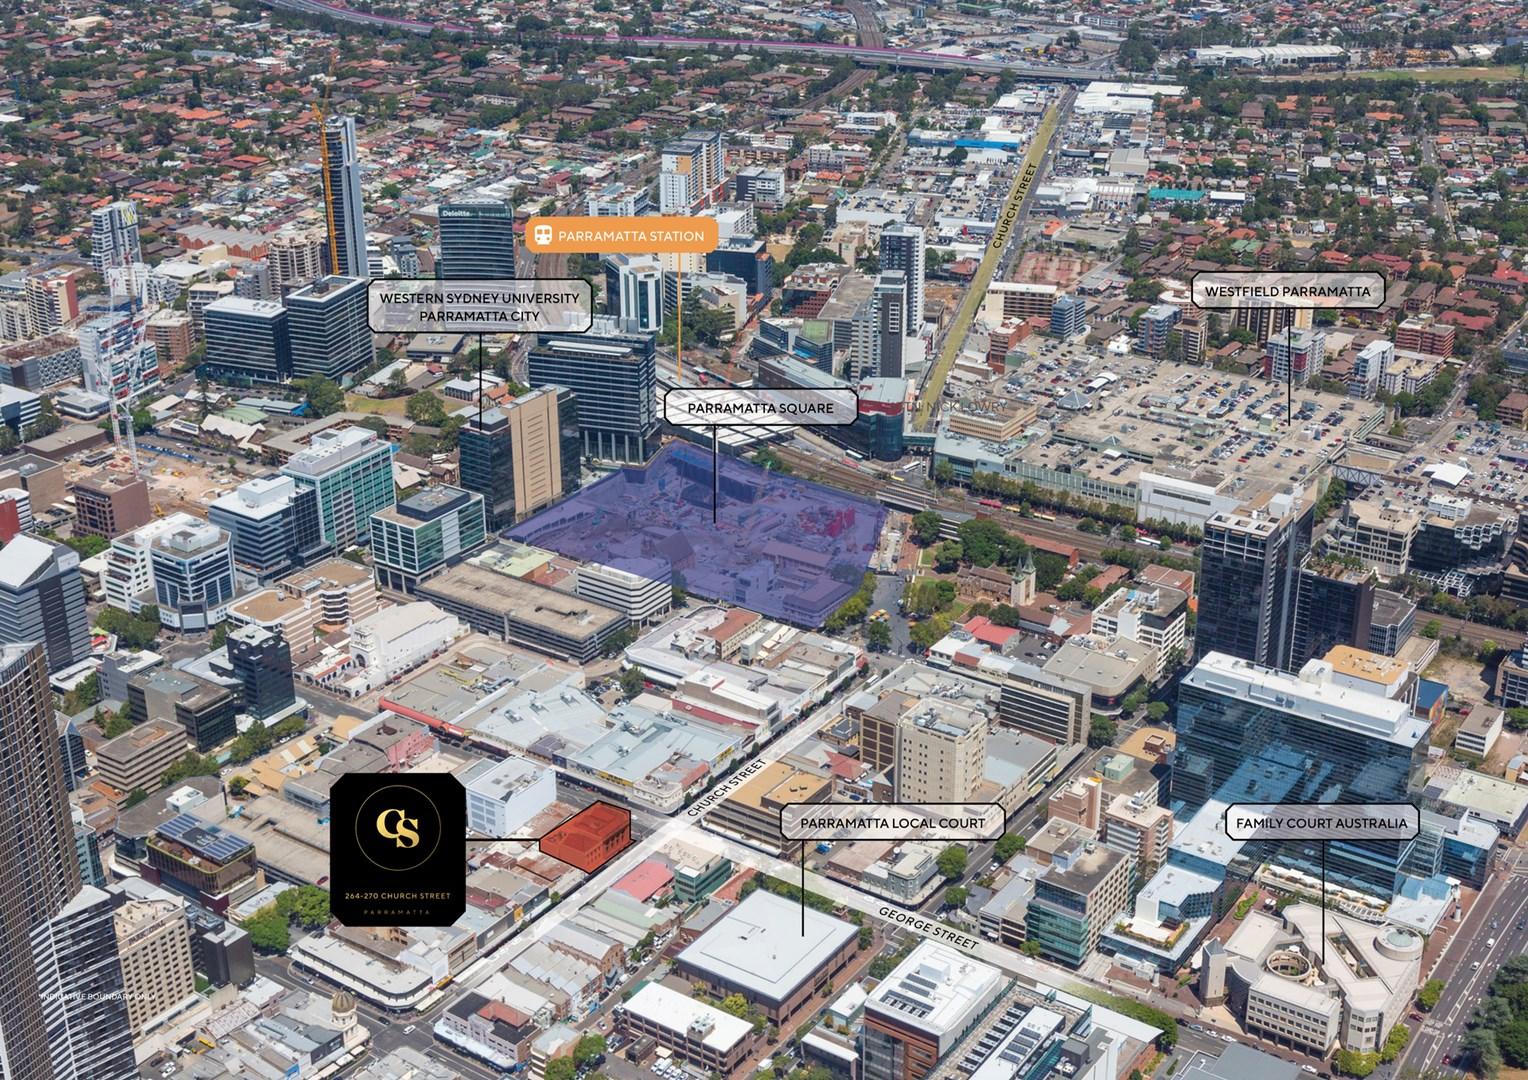 Property Report for 264 Church Street, Parramatta NSW 2150